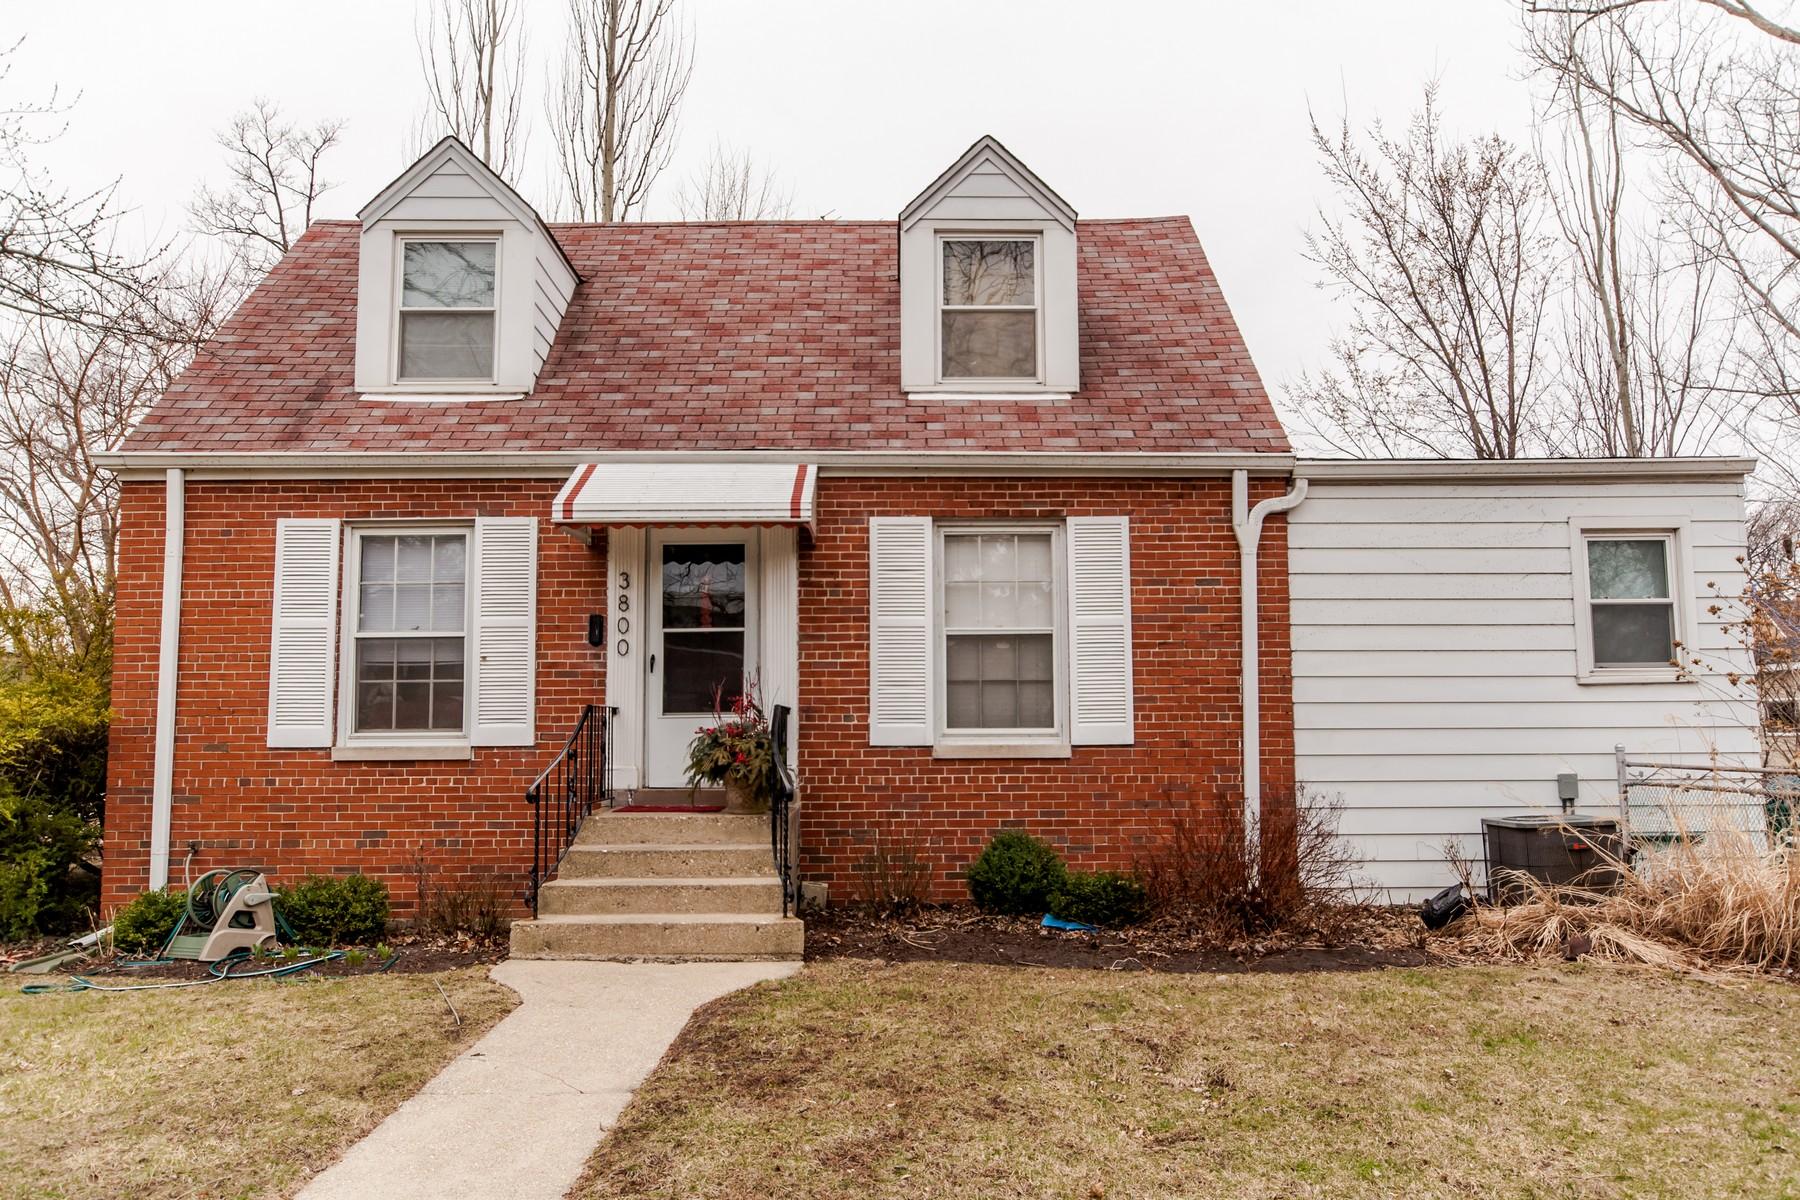 Casa para uma família para Venda às Cute Cape Cod On Large Corner Lot 3800 Kirk Street Skokie, Illinois, 60076 Estados Unidos